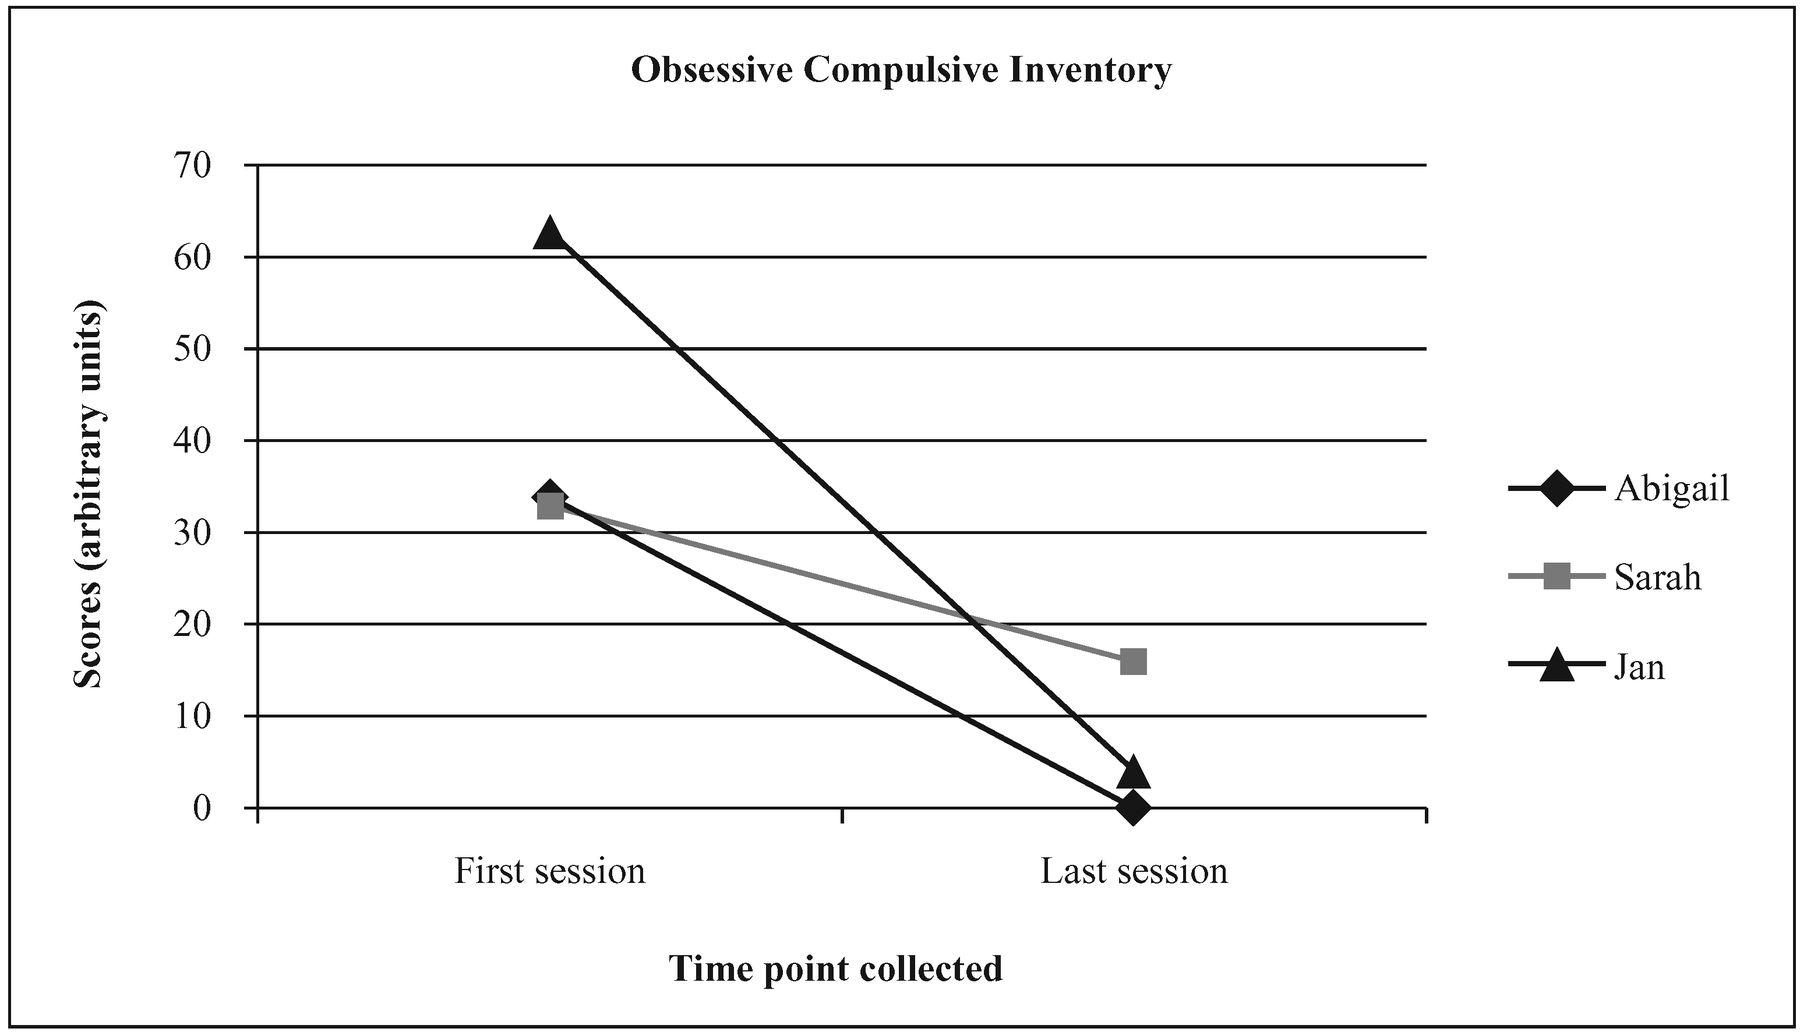 EMDR Treatment of Obsessive-Compulsive Disorder: Three Cases